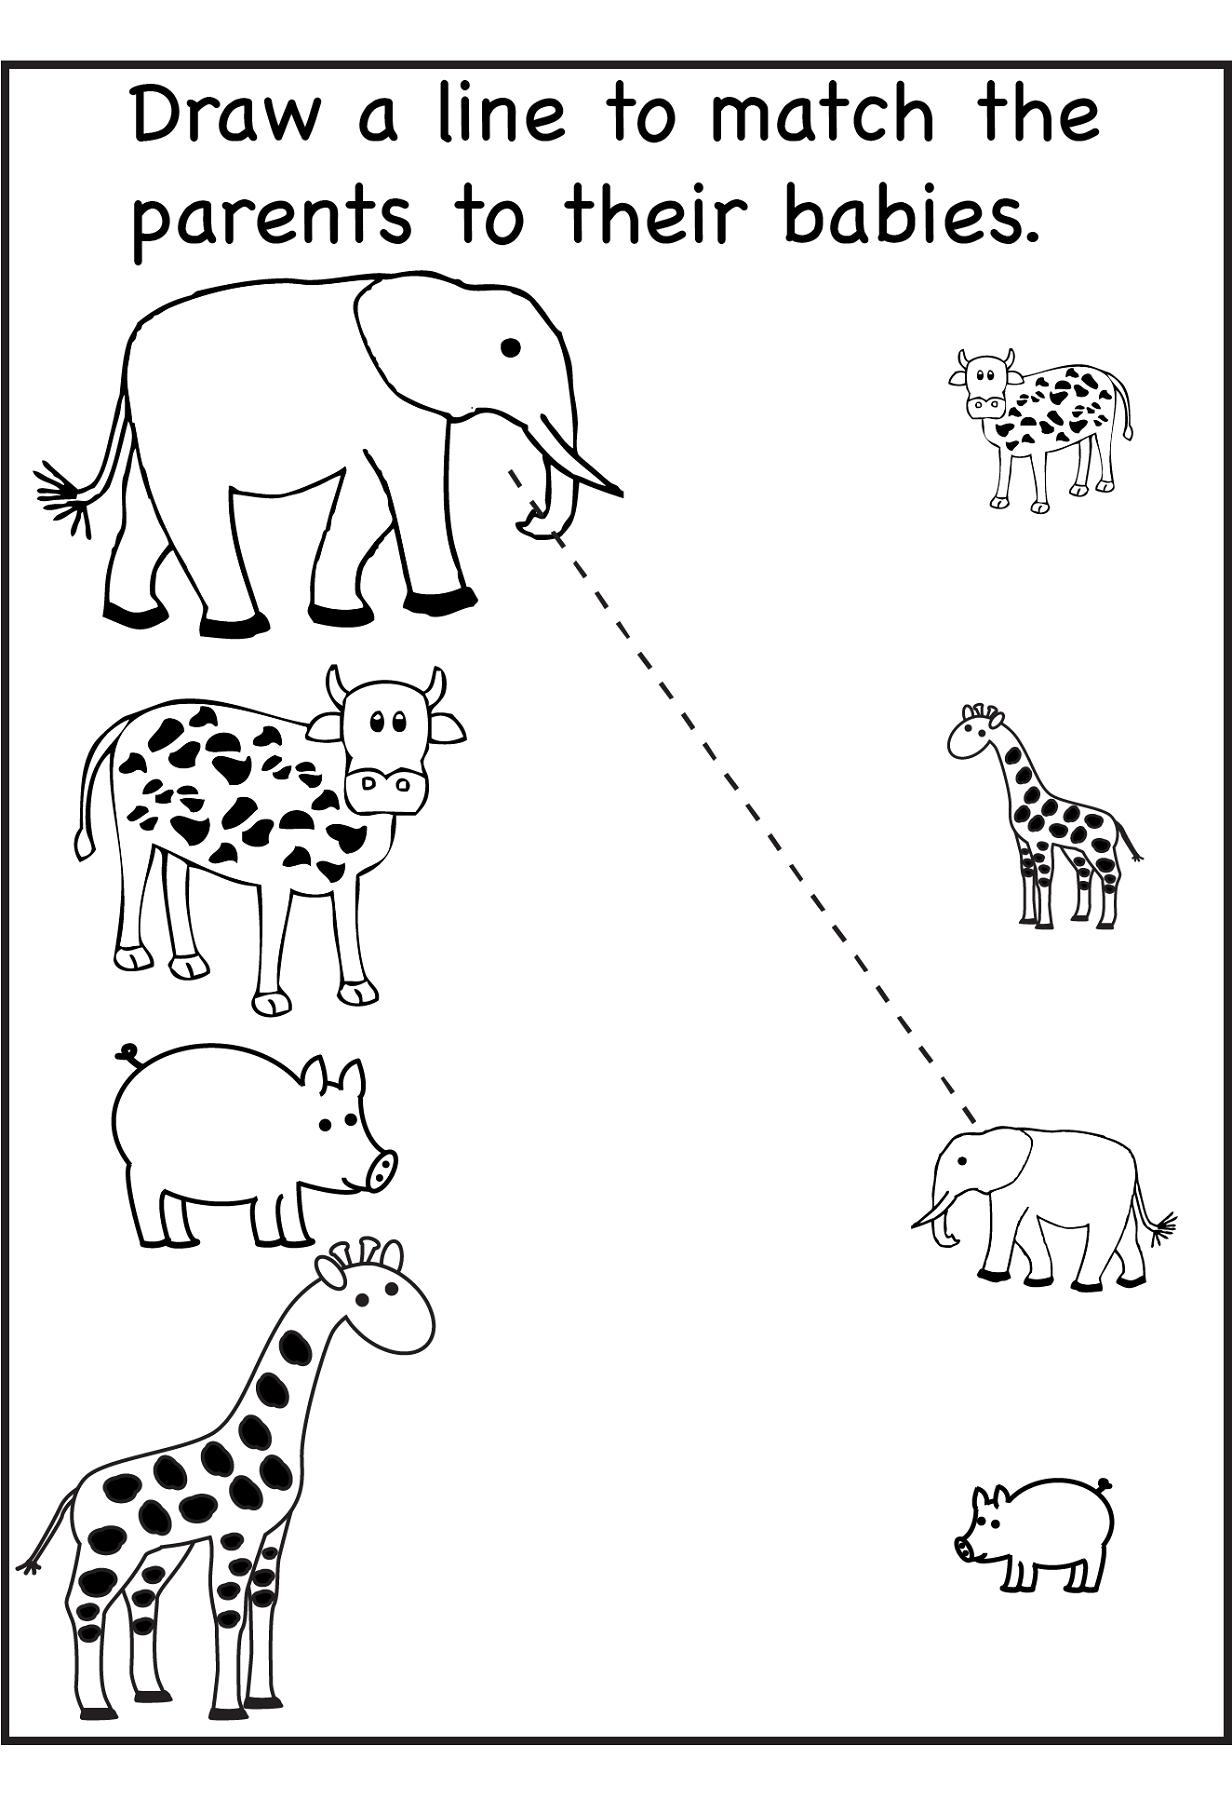 Printable Activity Sheets For Kids | Preschool | Preschool - Free Printable Activities For Preschoolers